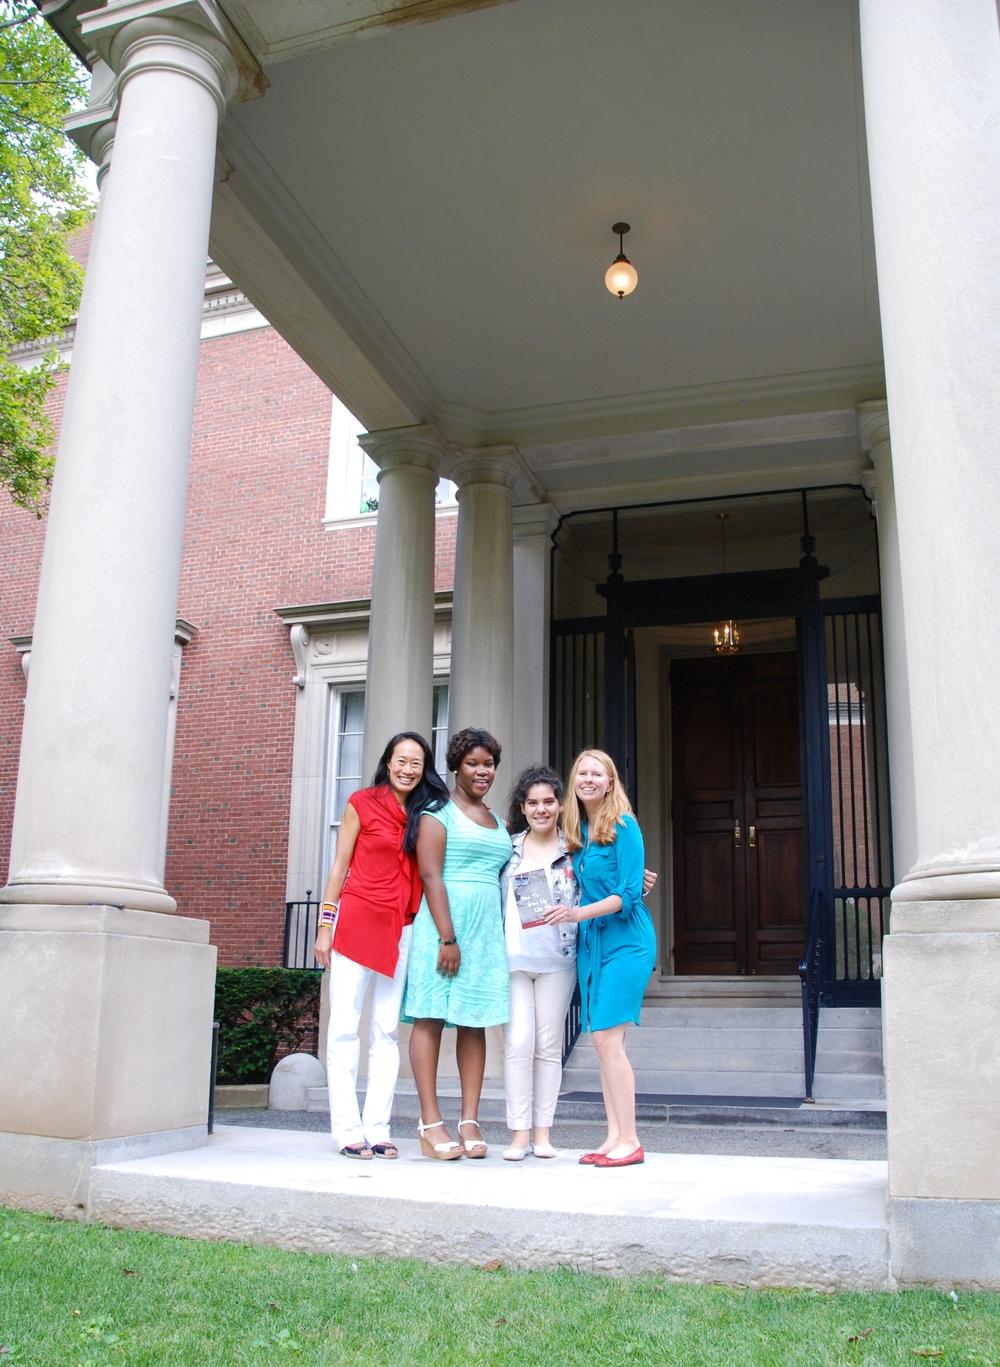 Team Shout Mouse International! Lana, Darne'sha, Litzi, and Kathy.